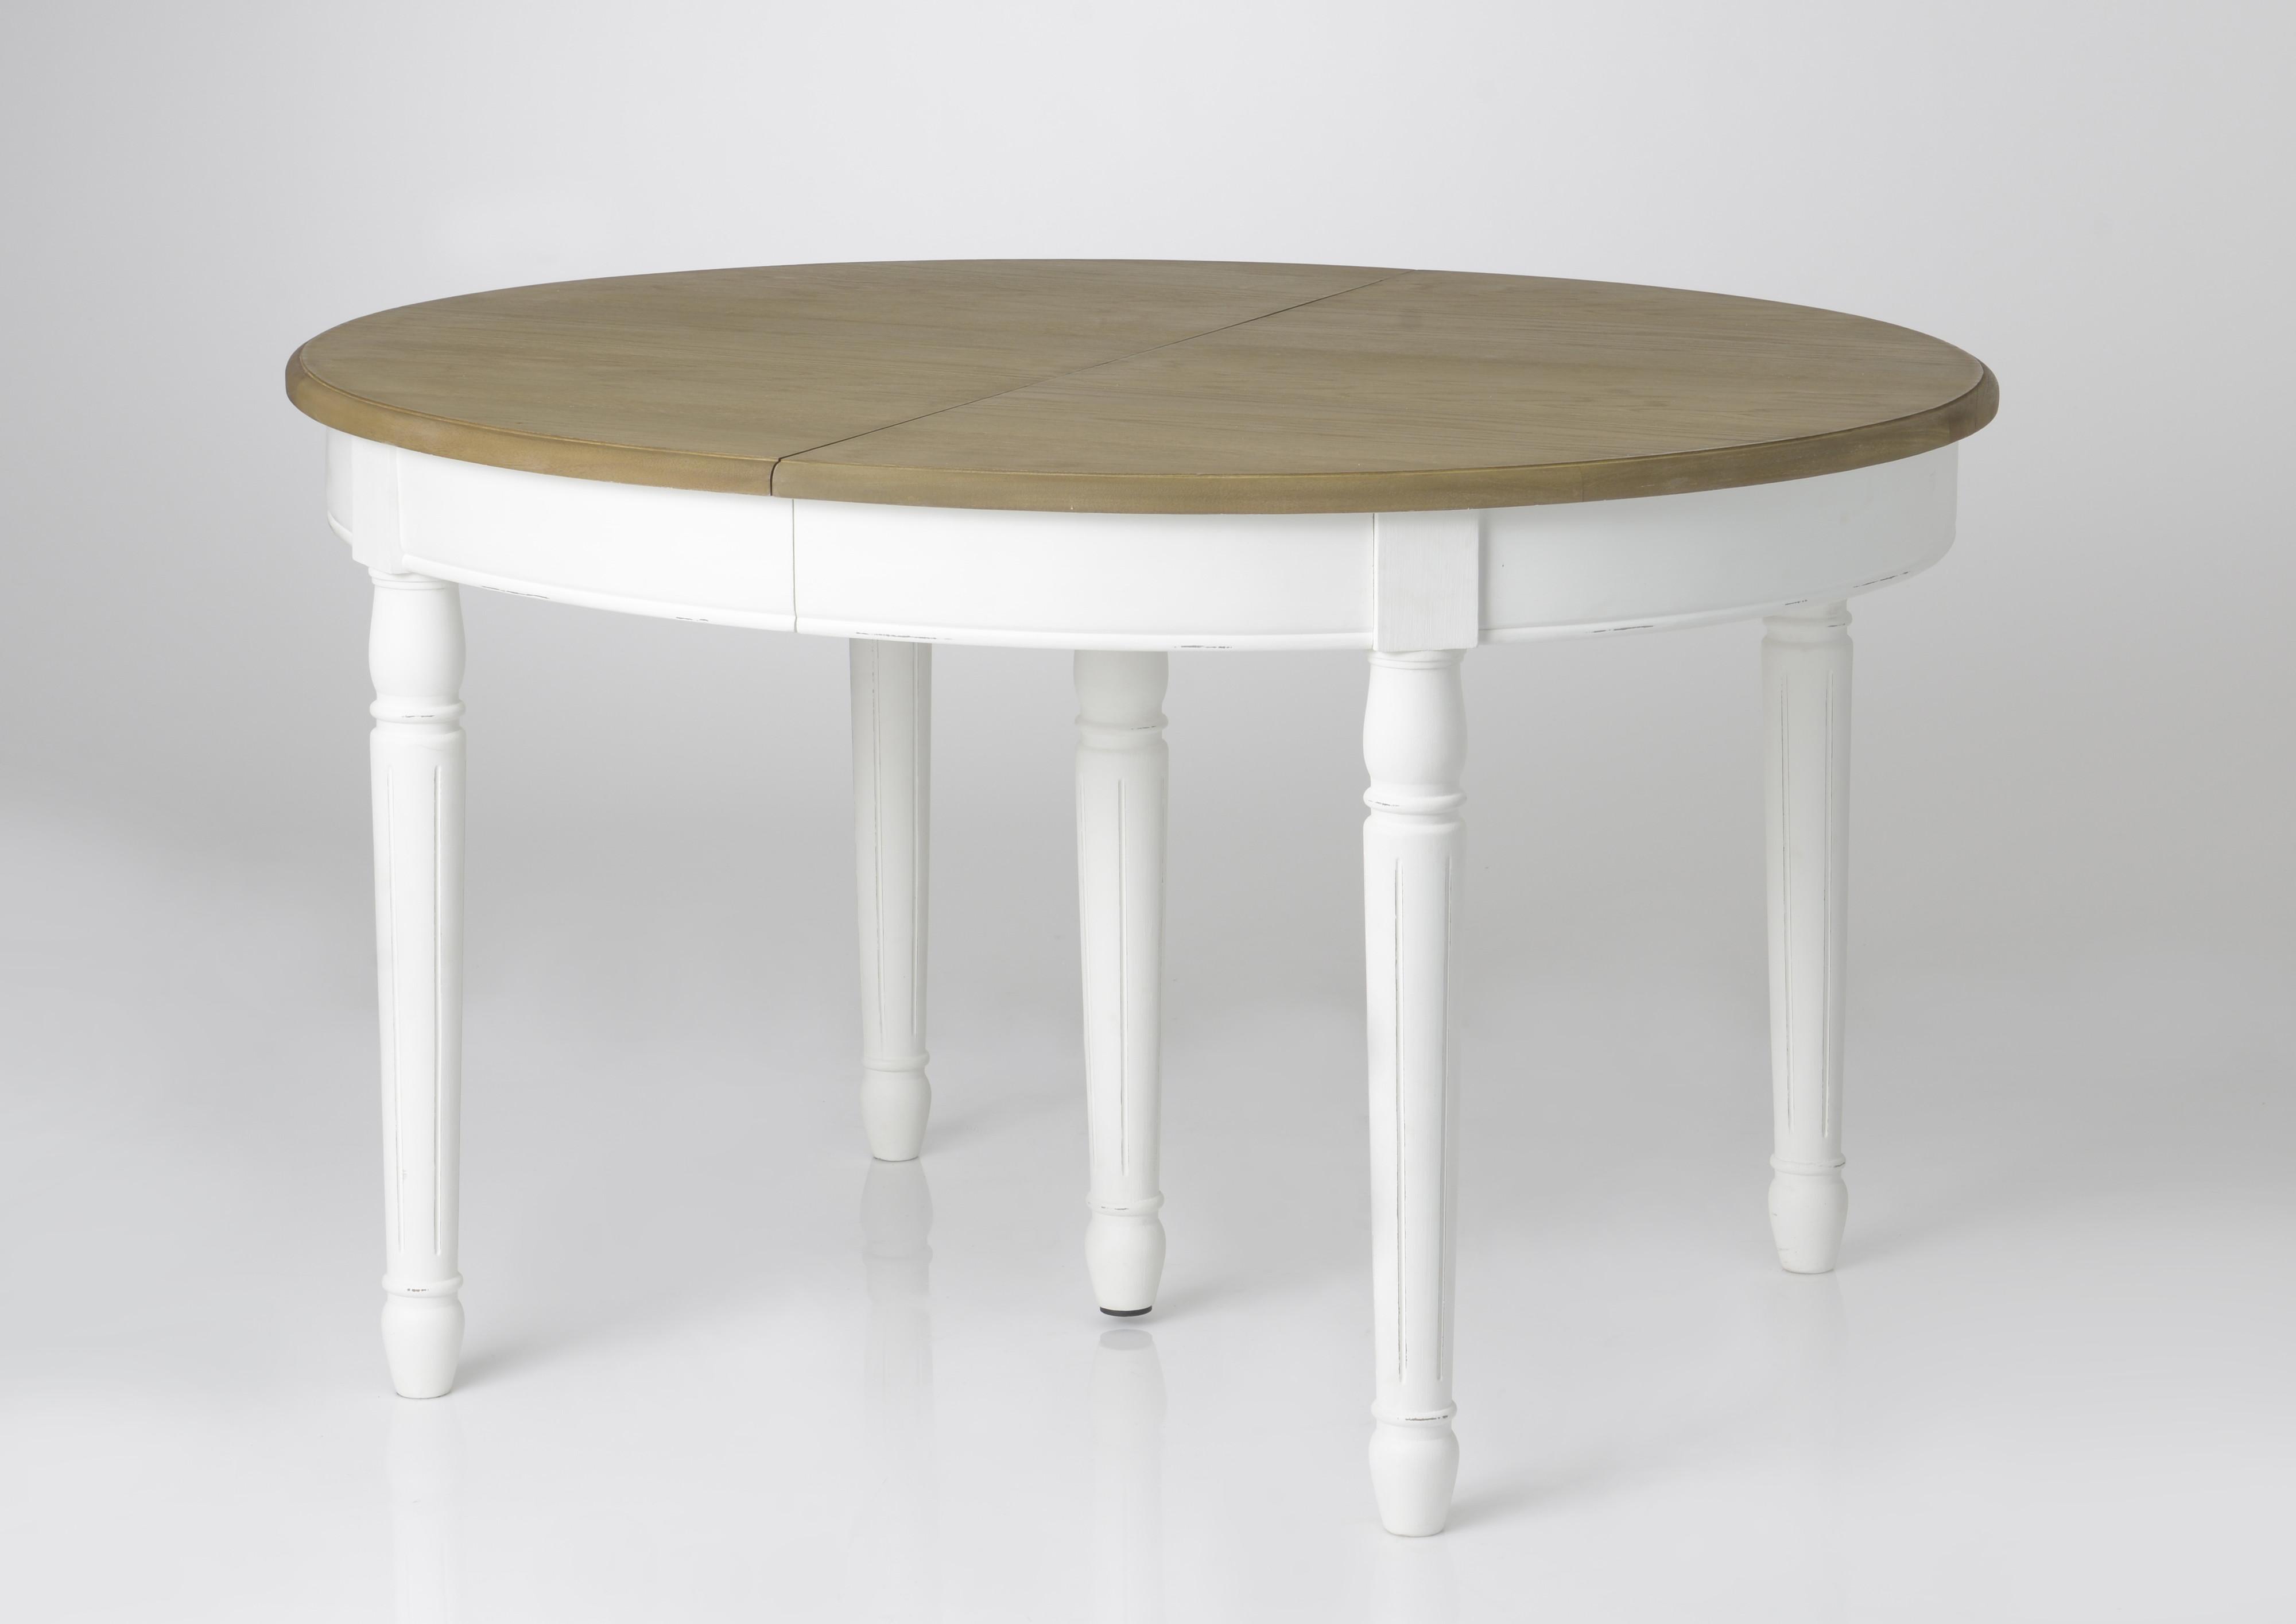 table a manger ovale extensible bois massif blanc prague tables a manger pier import